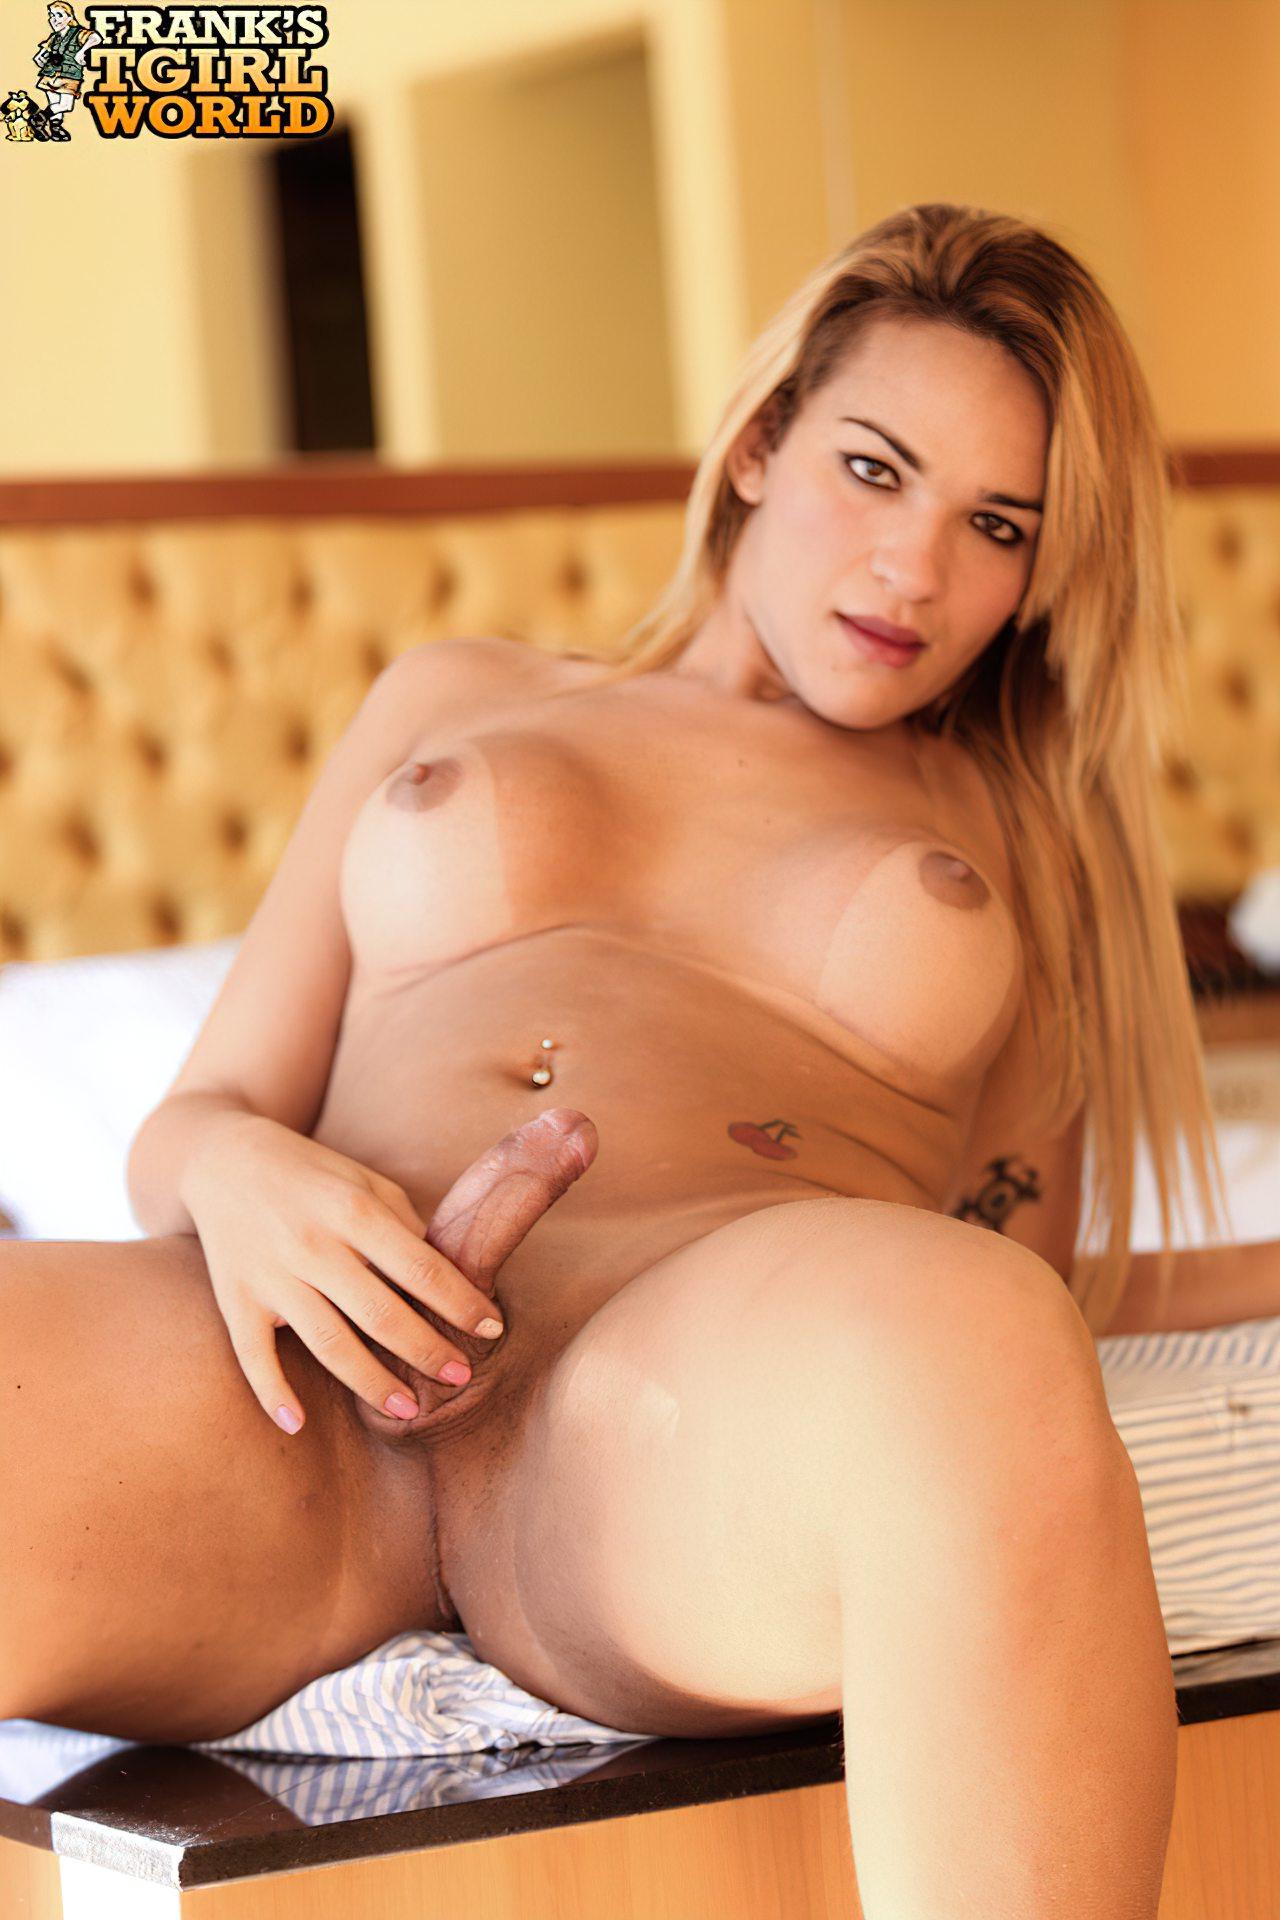 Leticia Freitaz Transex Nua (8)